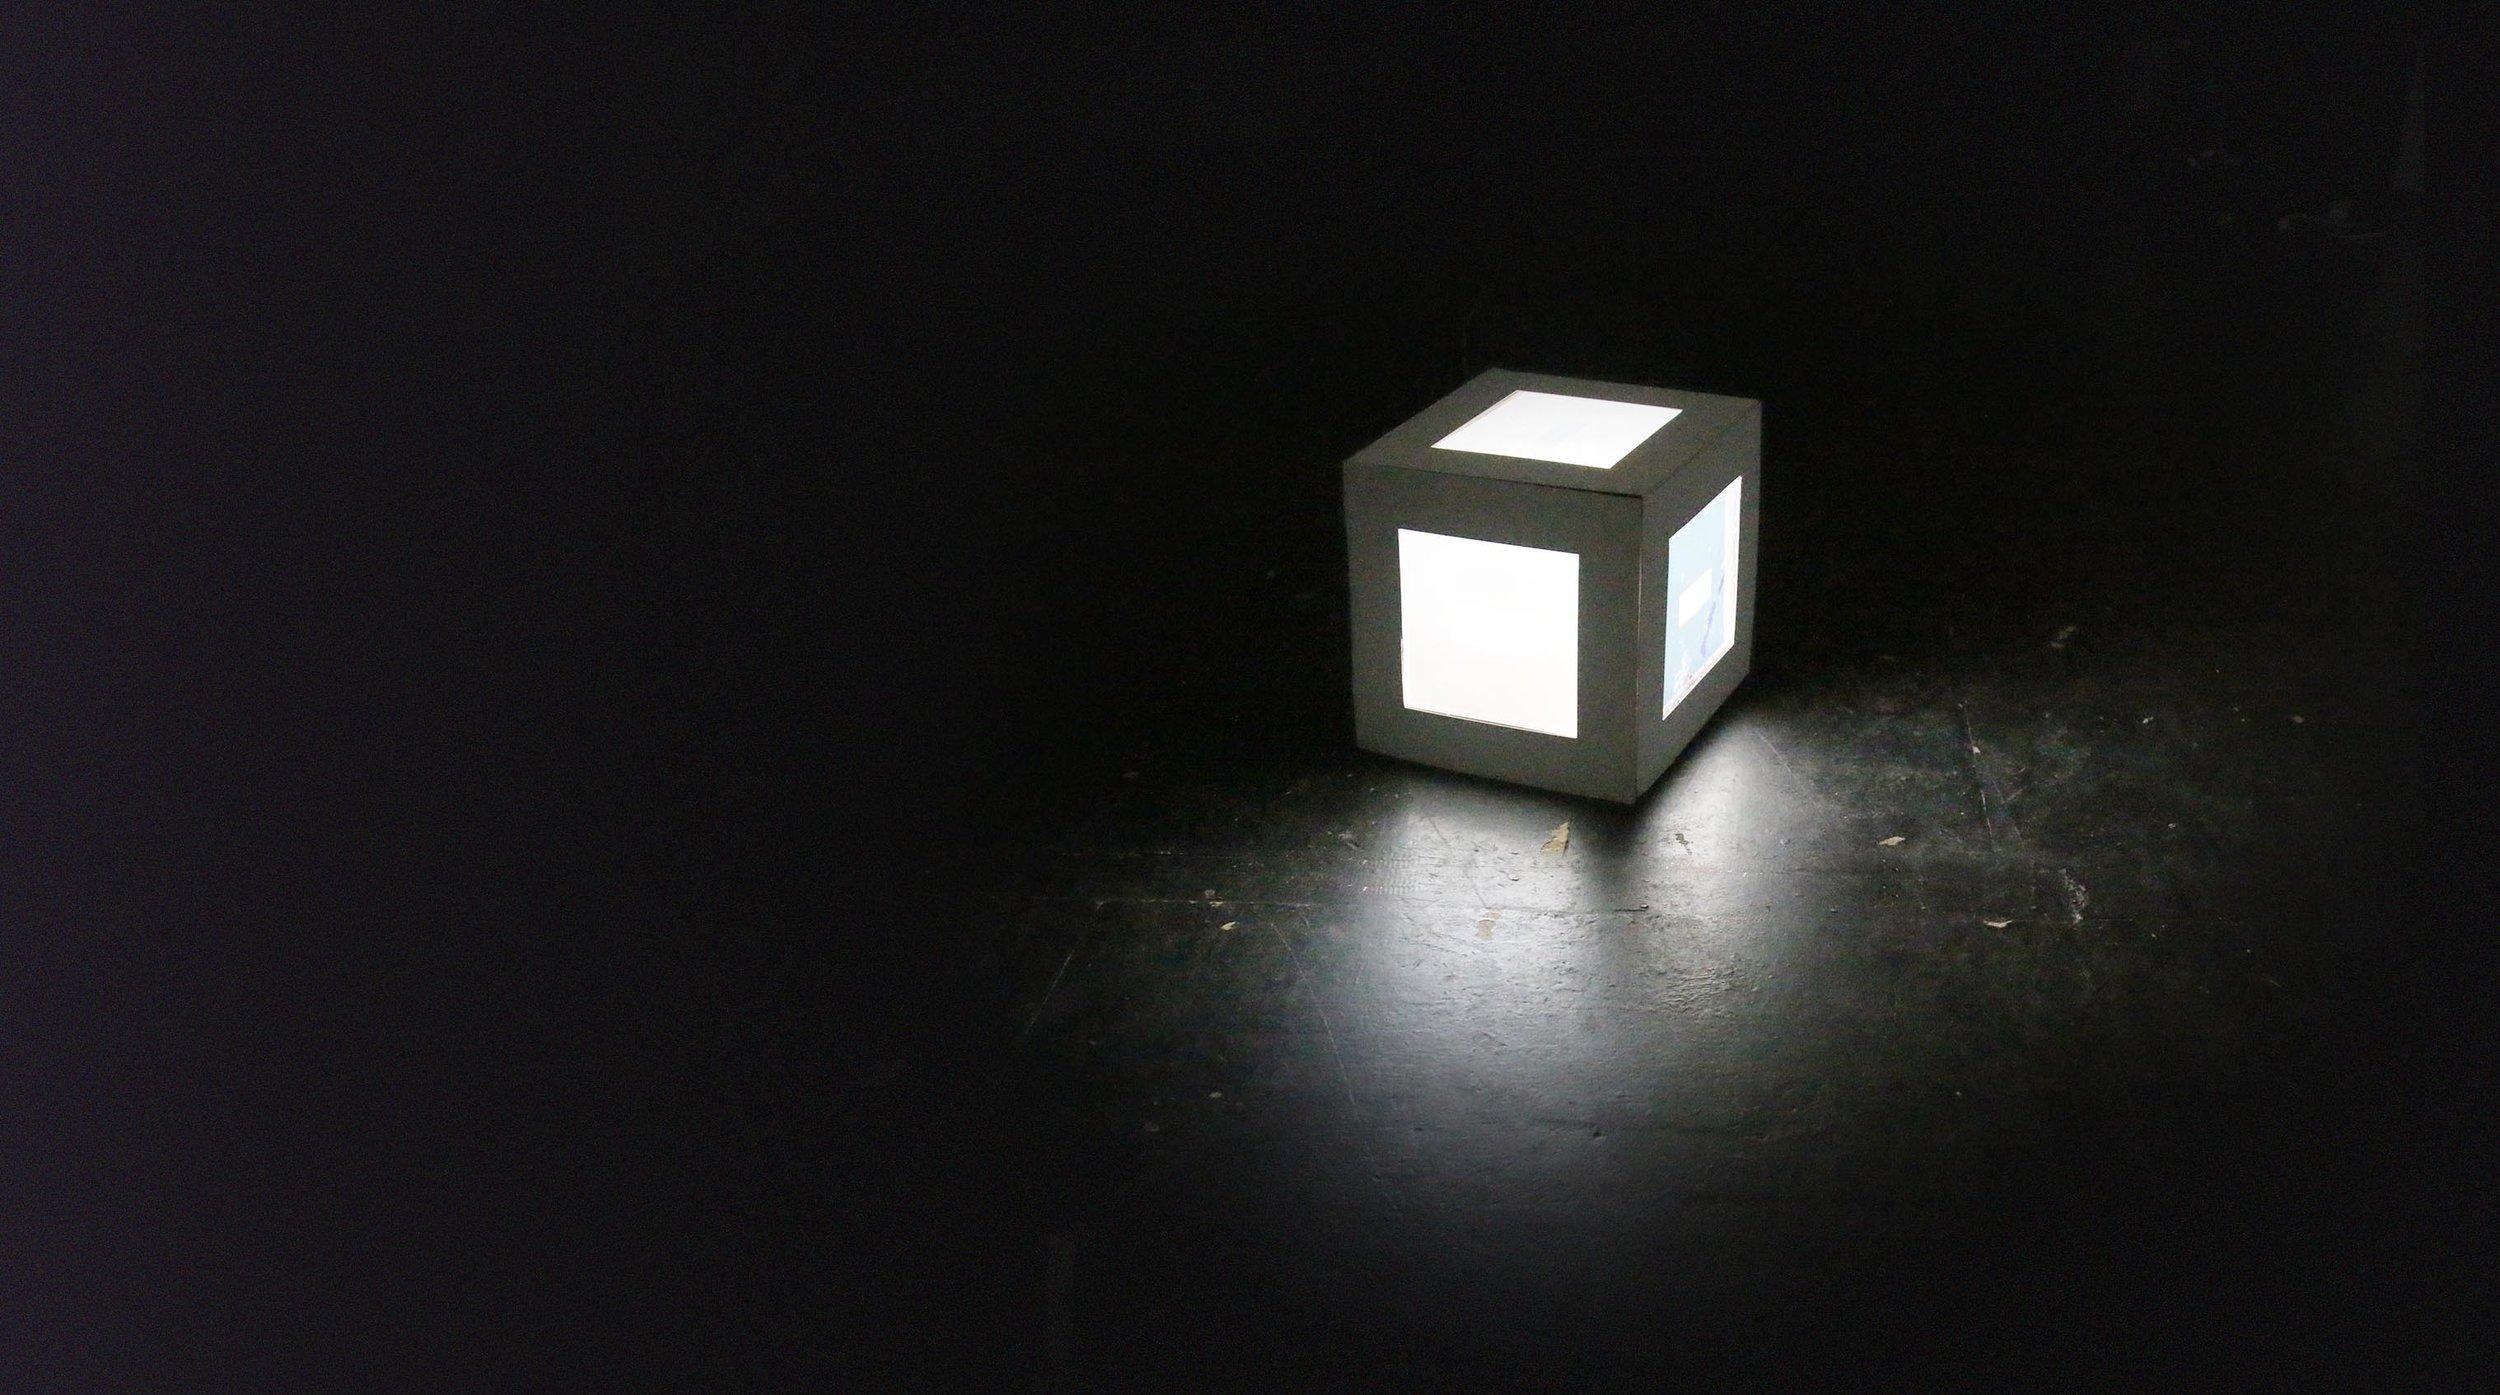 box_landscape.jpg